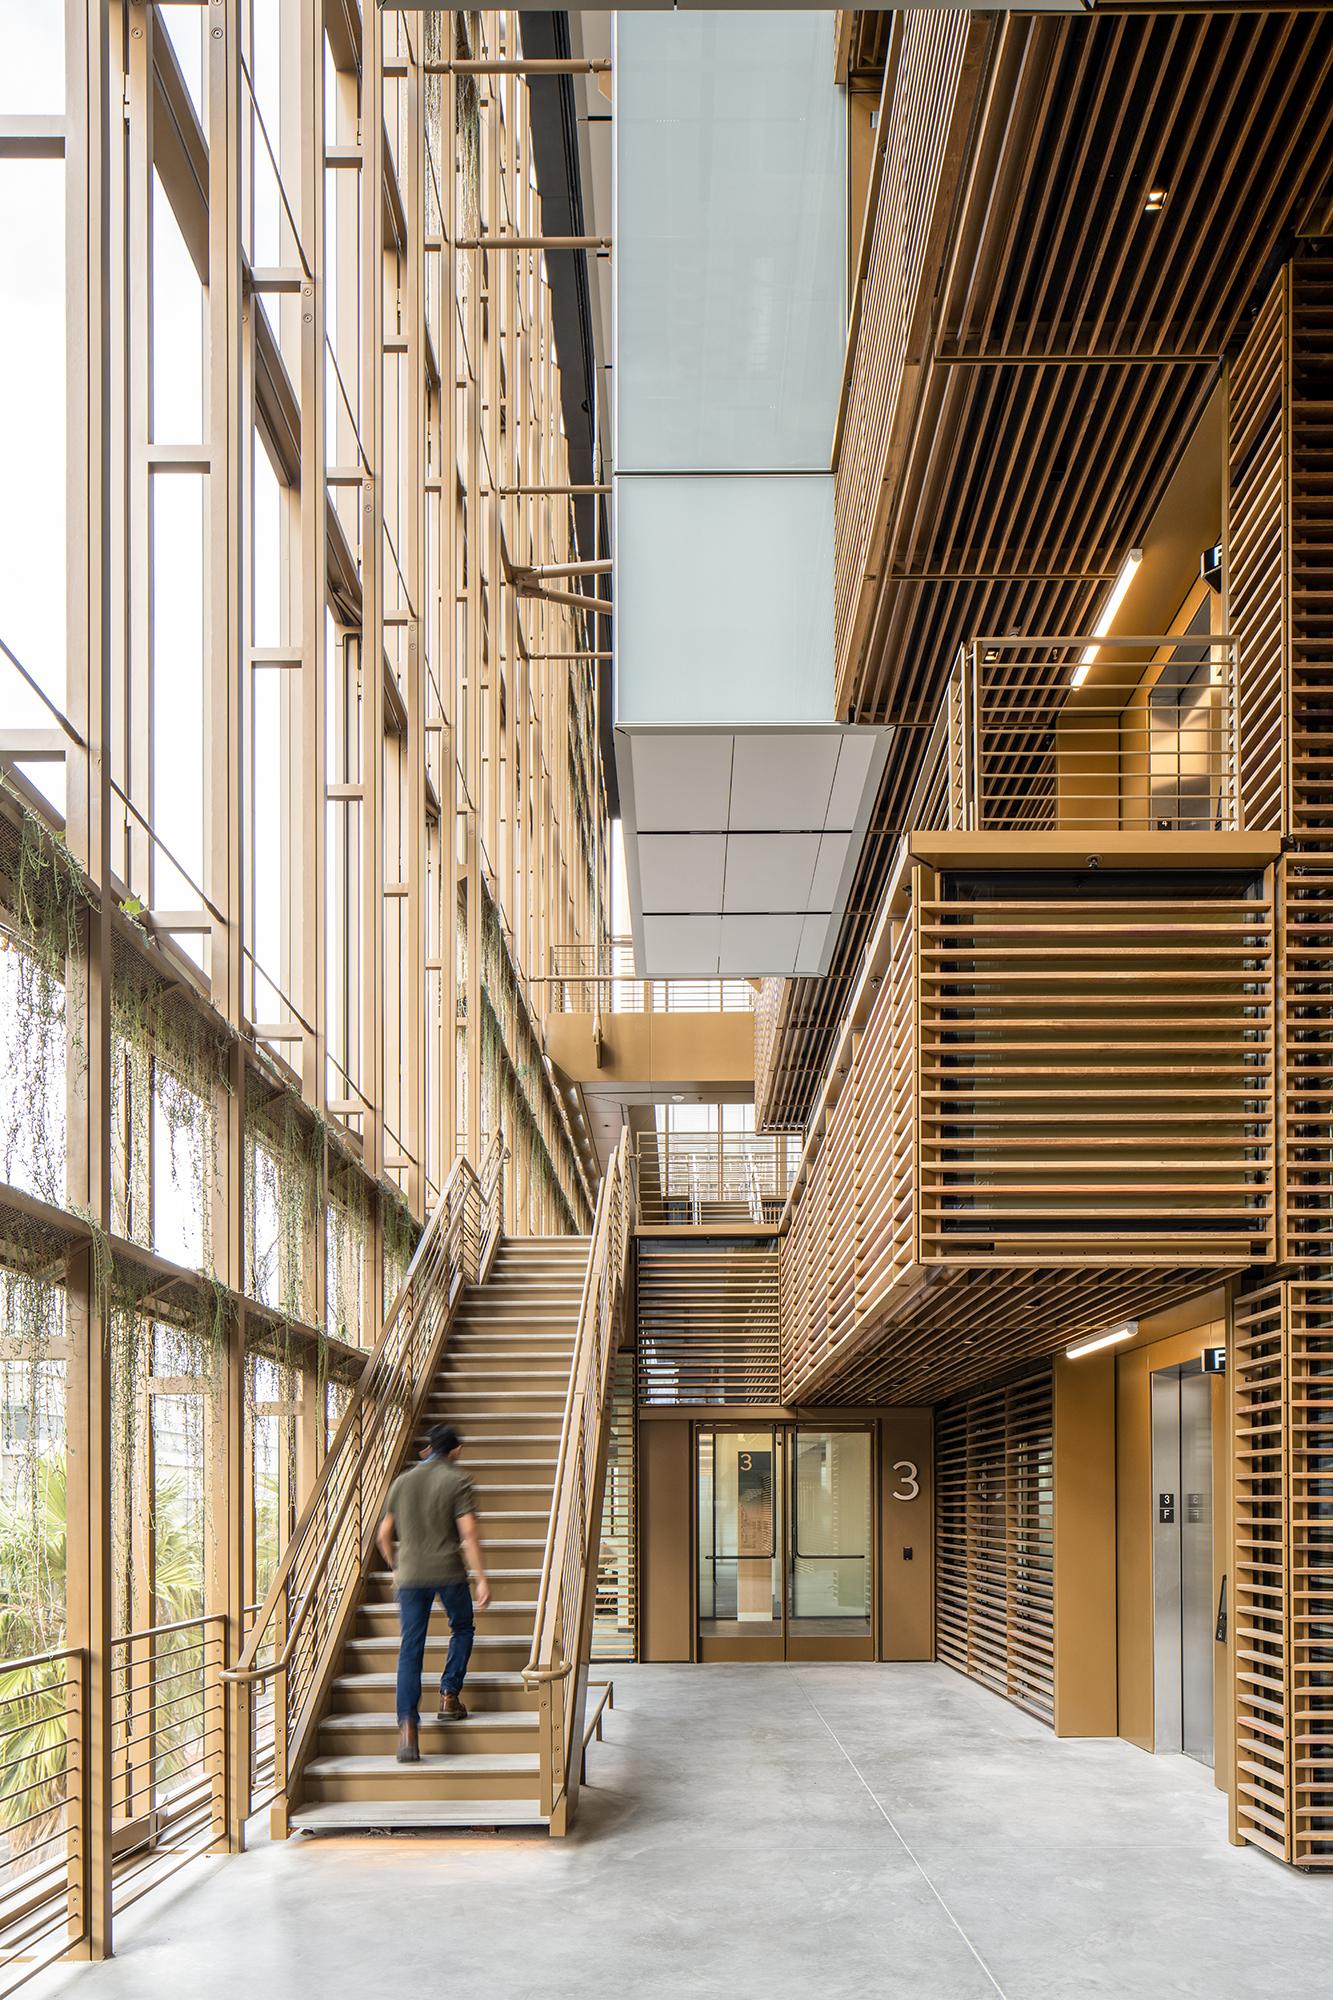 Uber Wold Headquarters by Quezada Architecture (Fred Quezada, Cecilia Quezada, Ed Tingley)